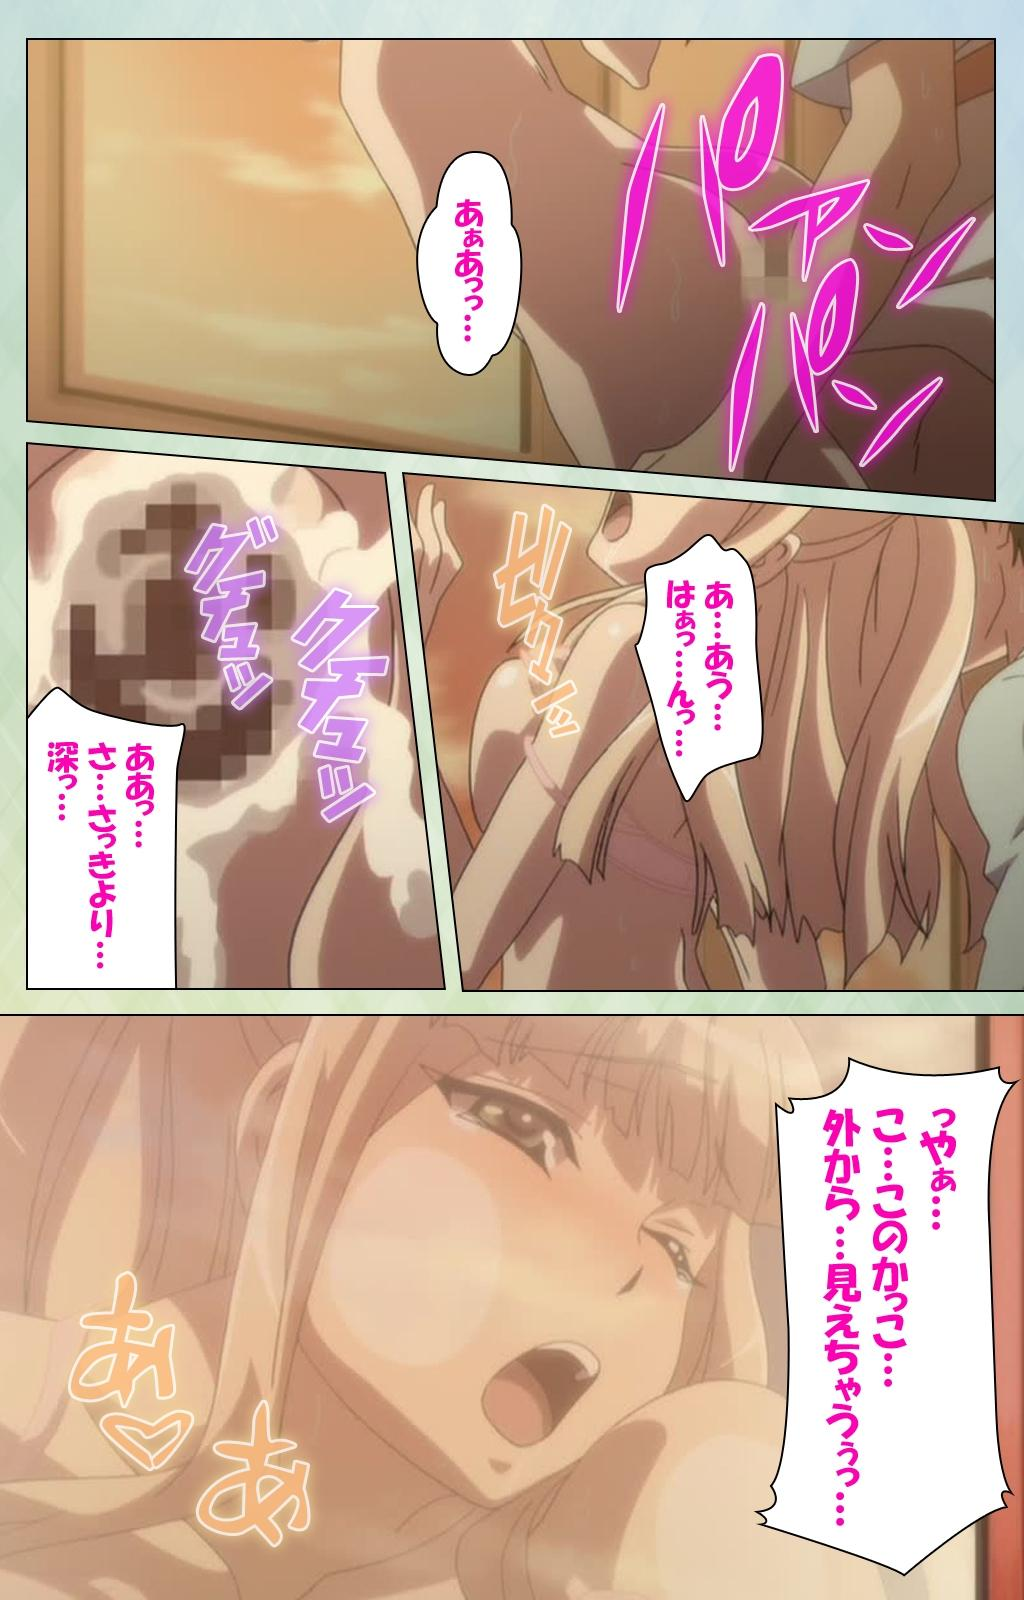 Furueru Kuchibiru fuzzy lips1 Complete Ban 82